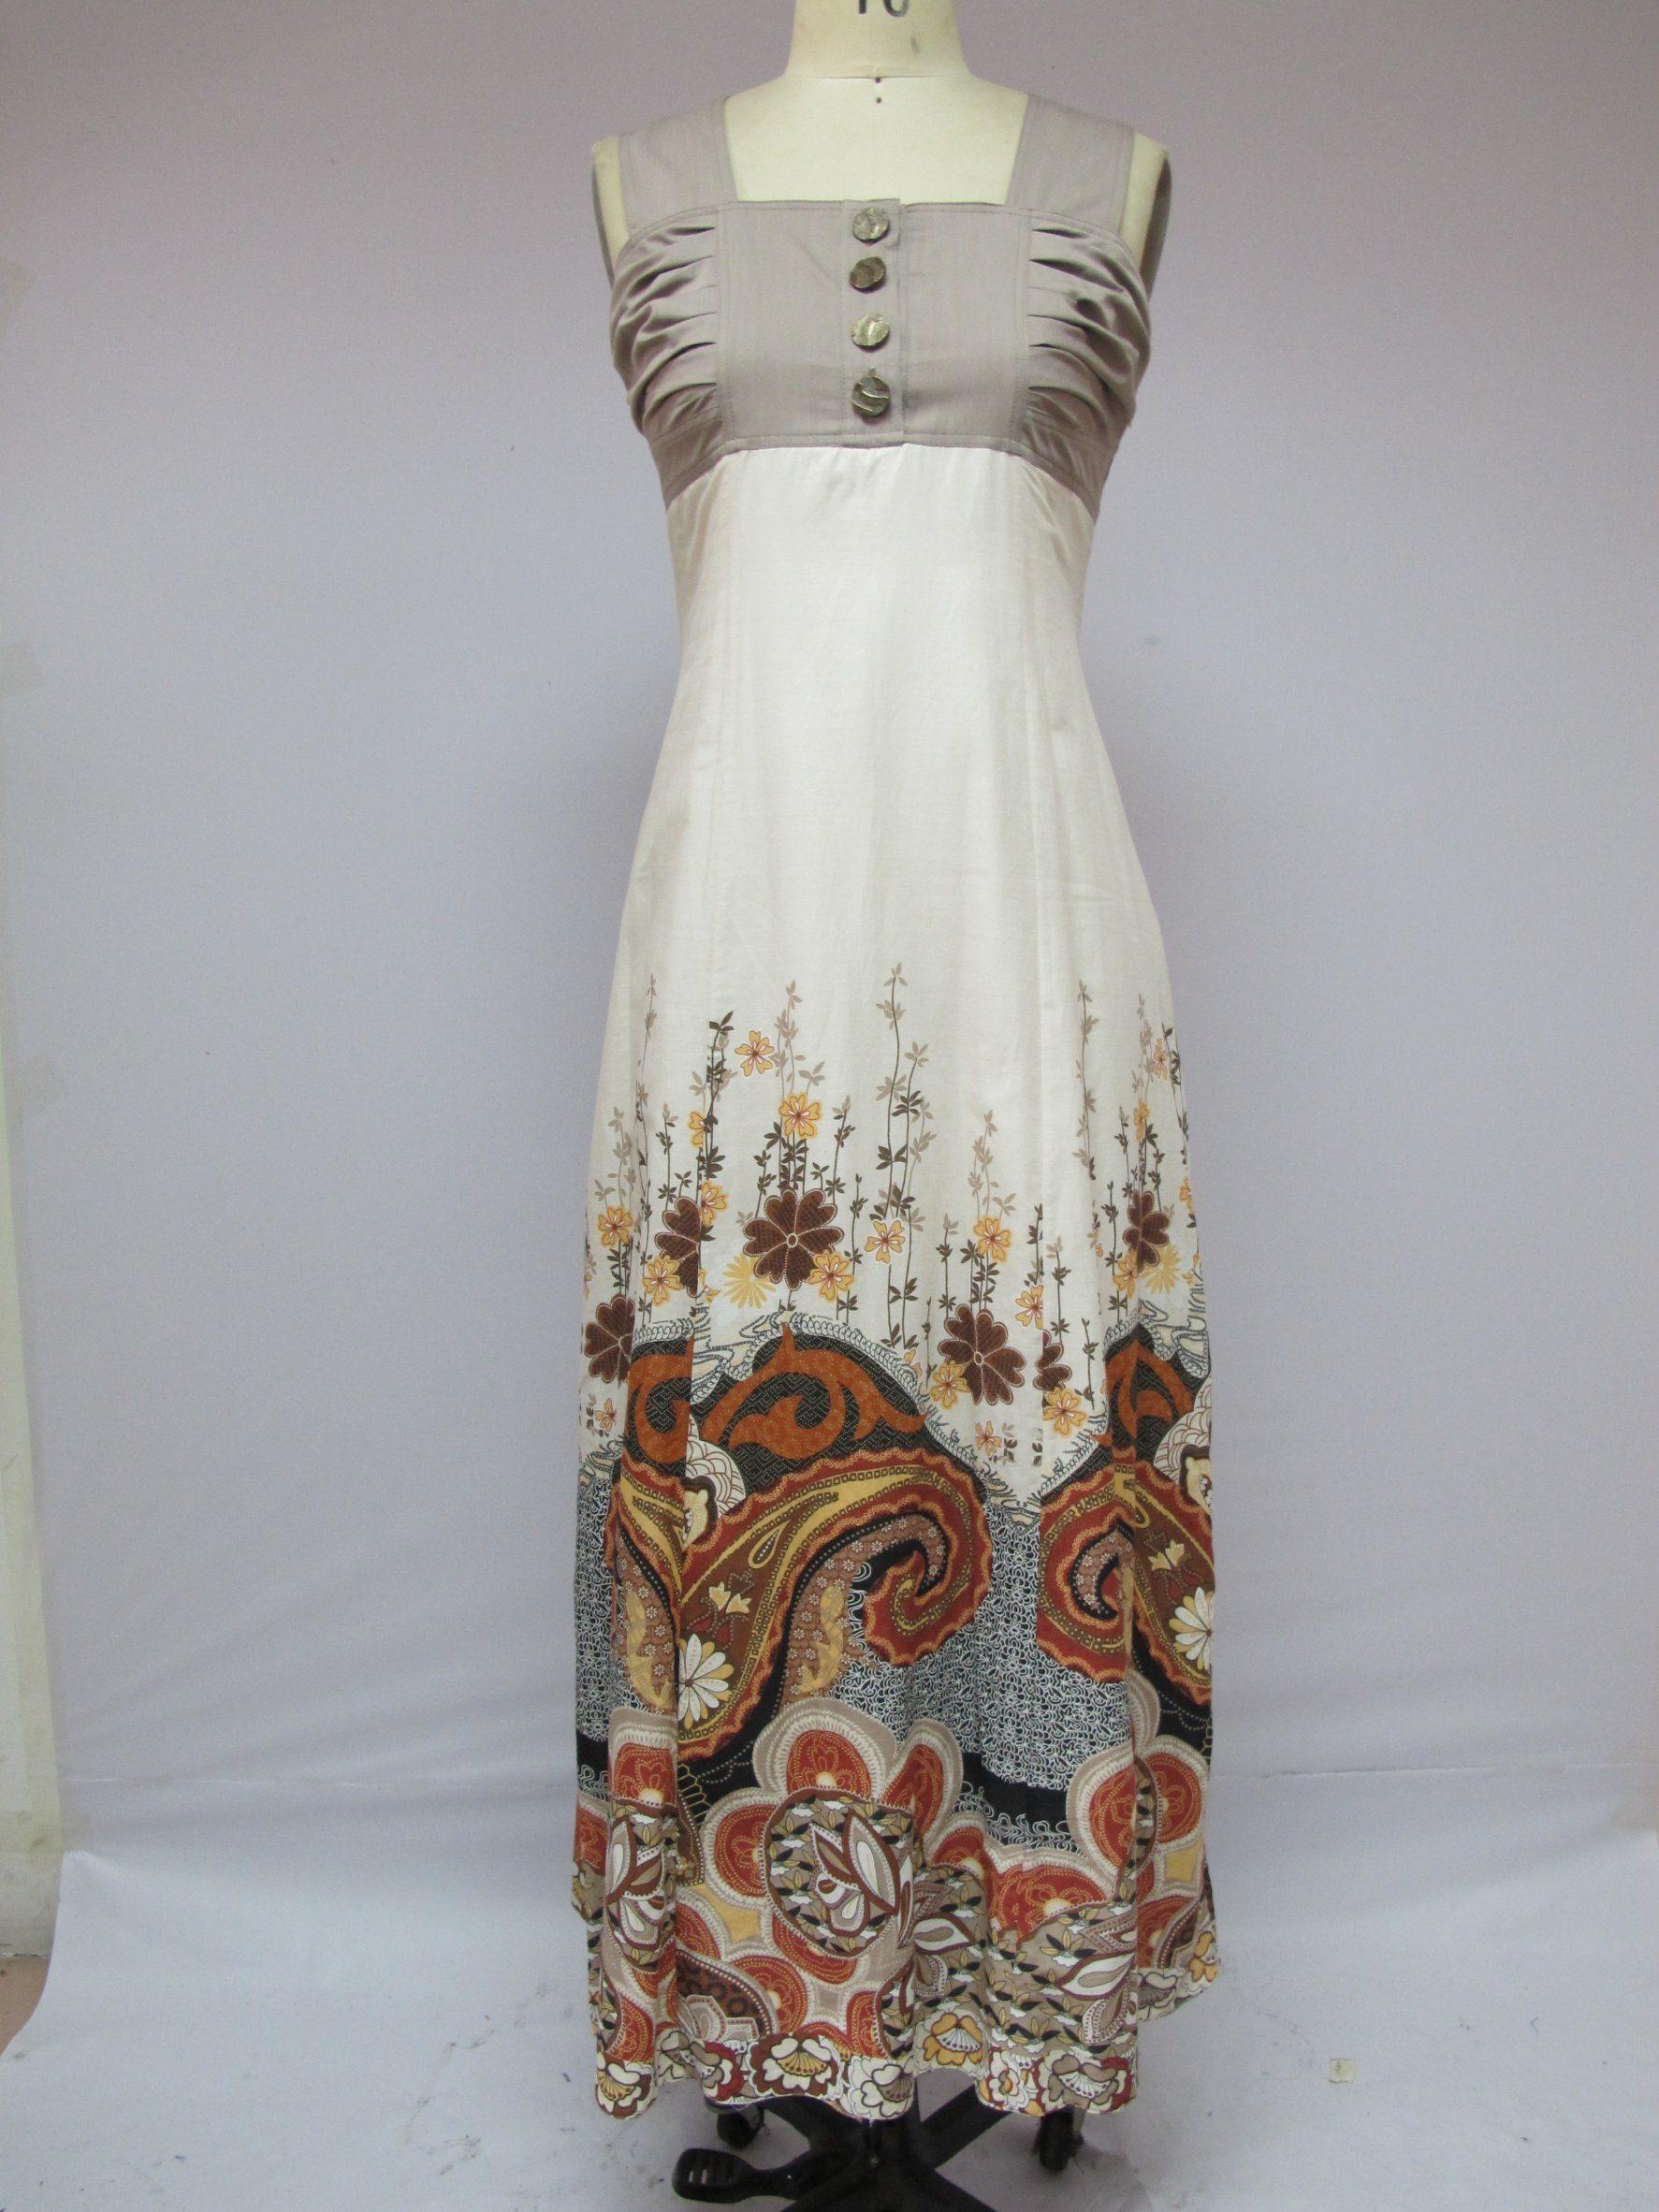 Multicoloured Sleeveless Slimmering-Waist Button Sexy Fashion Ldies Dress